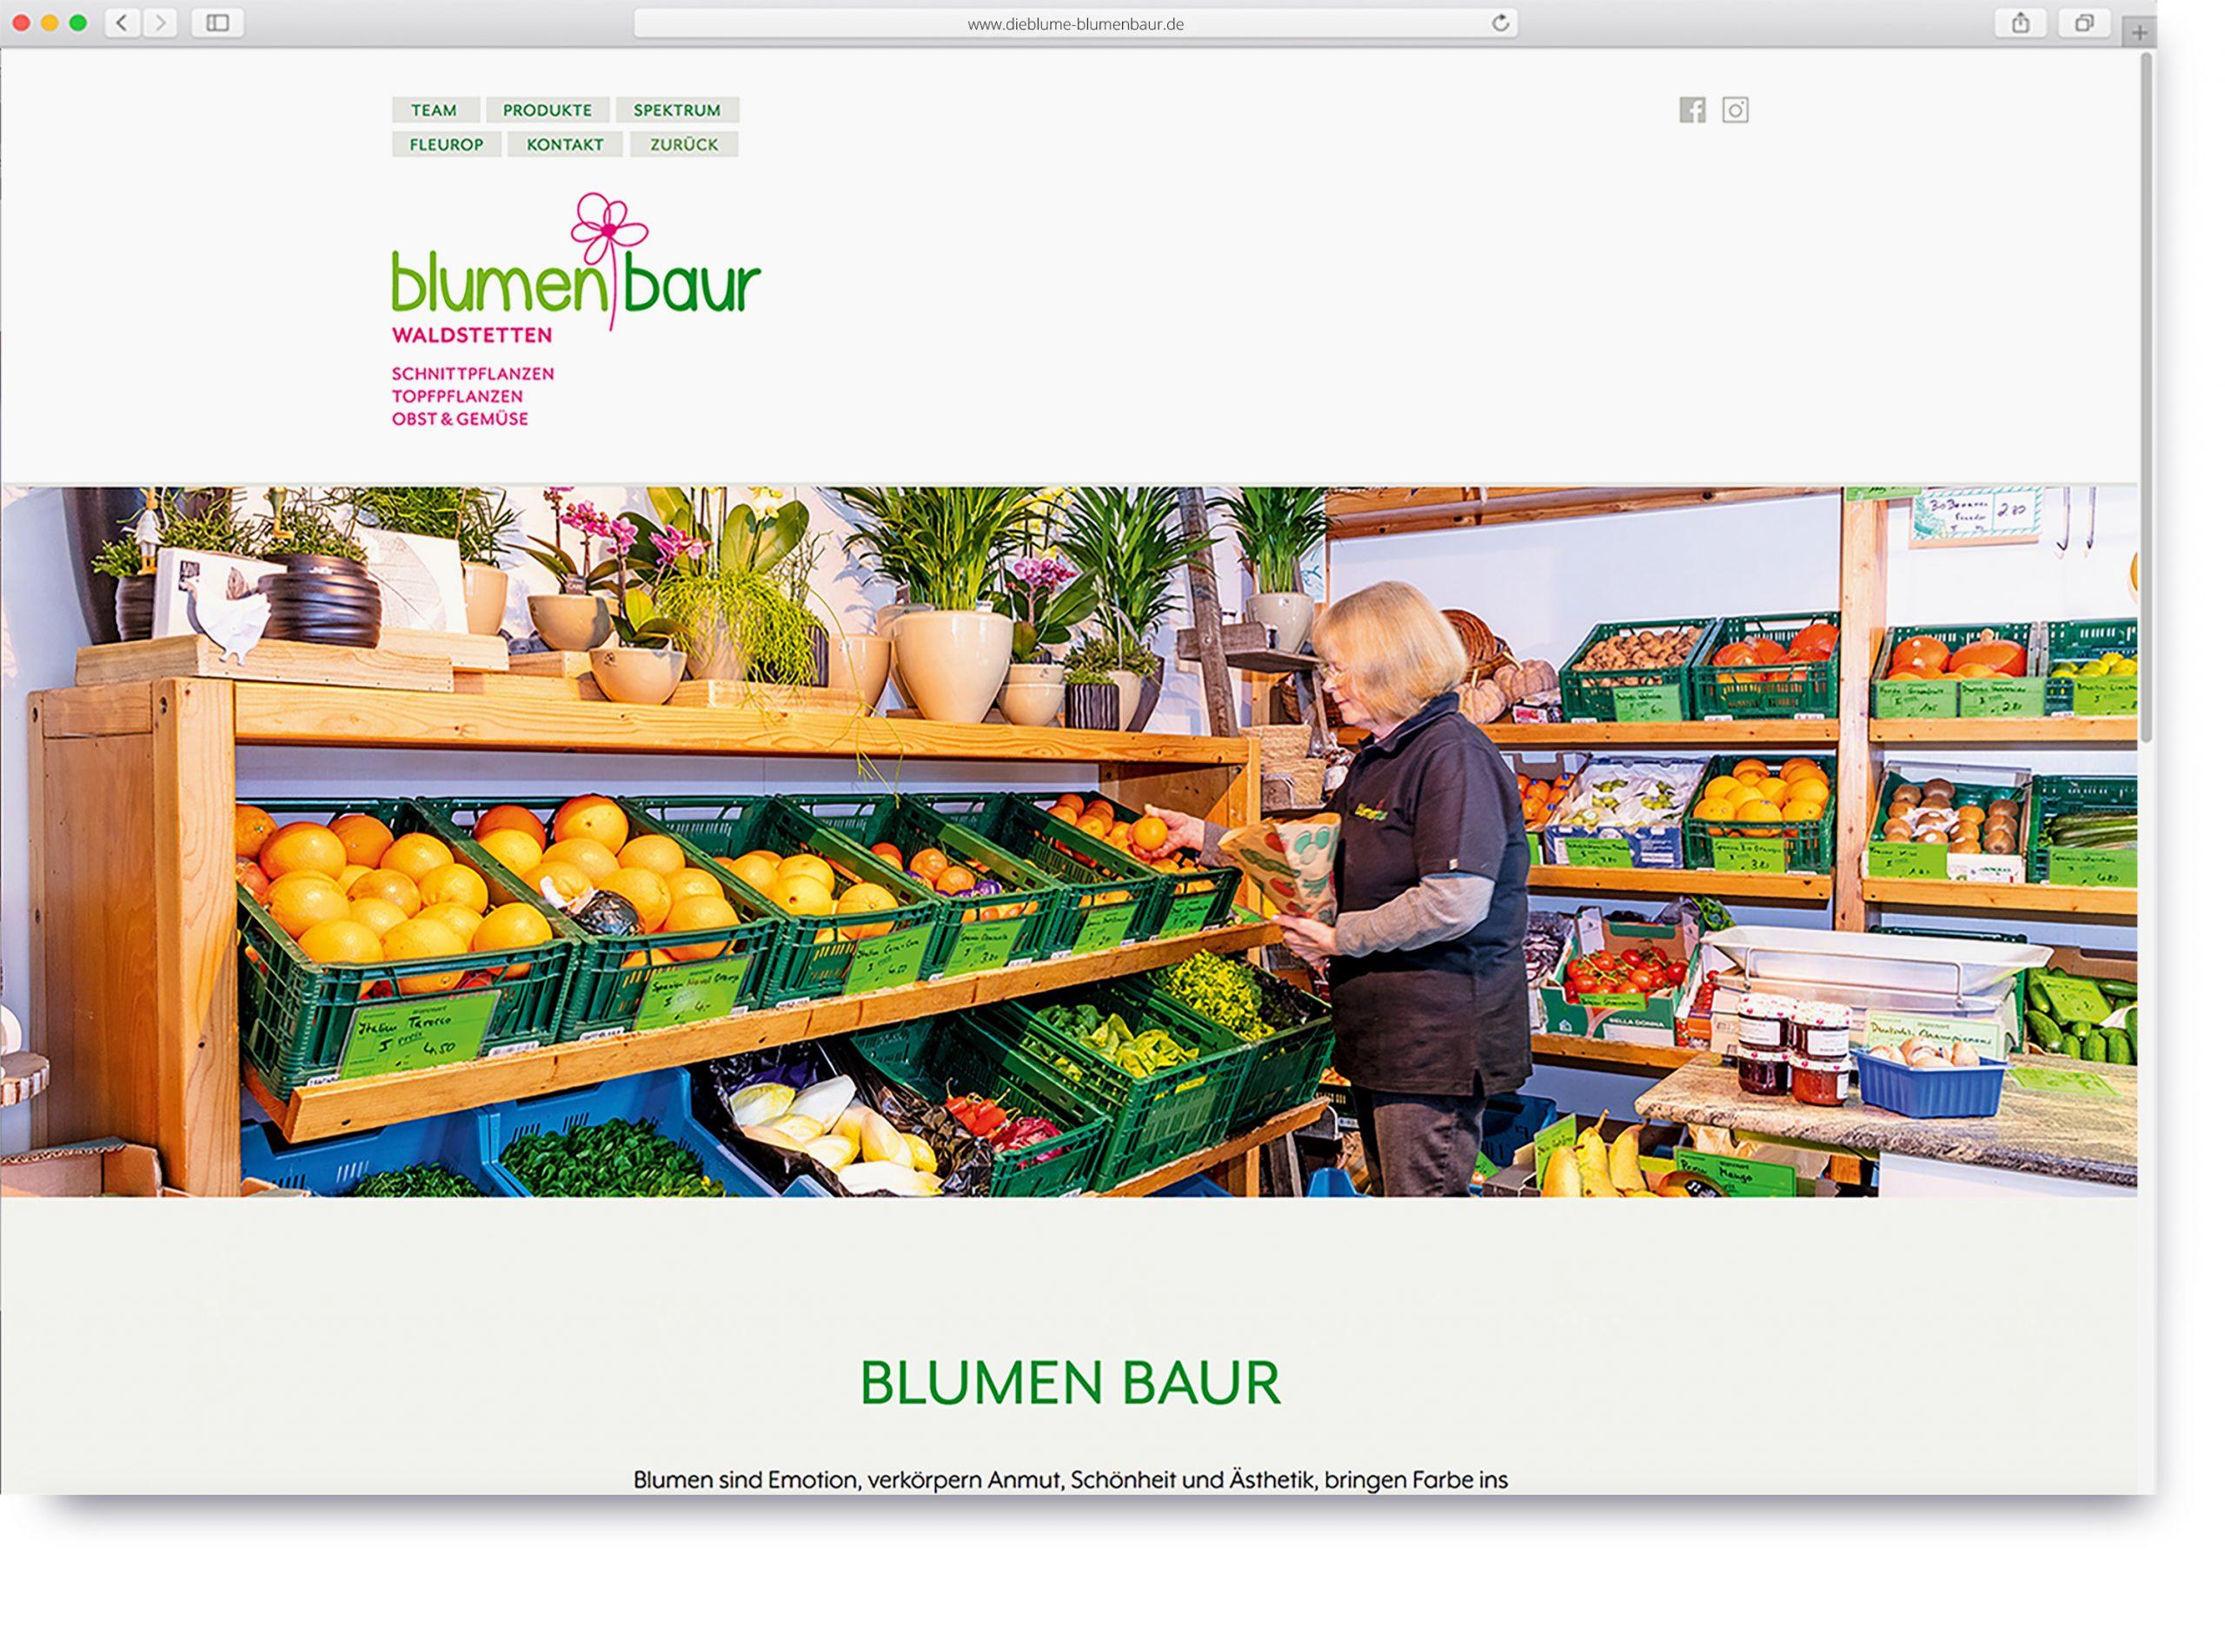 dieblume-blumenbaur-website-3-scaled.jpg